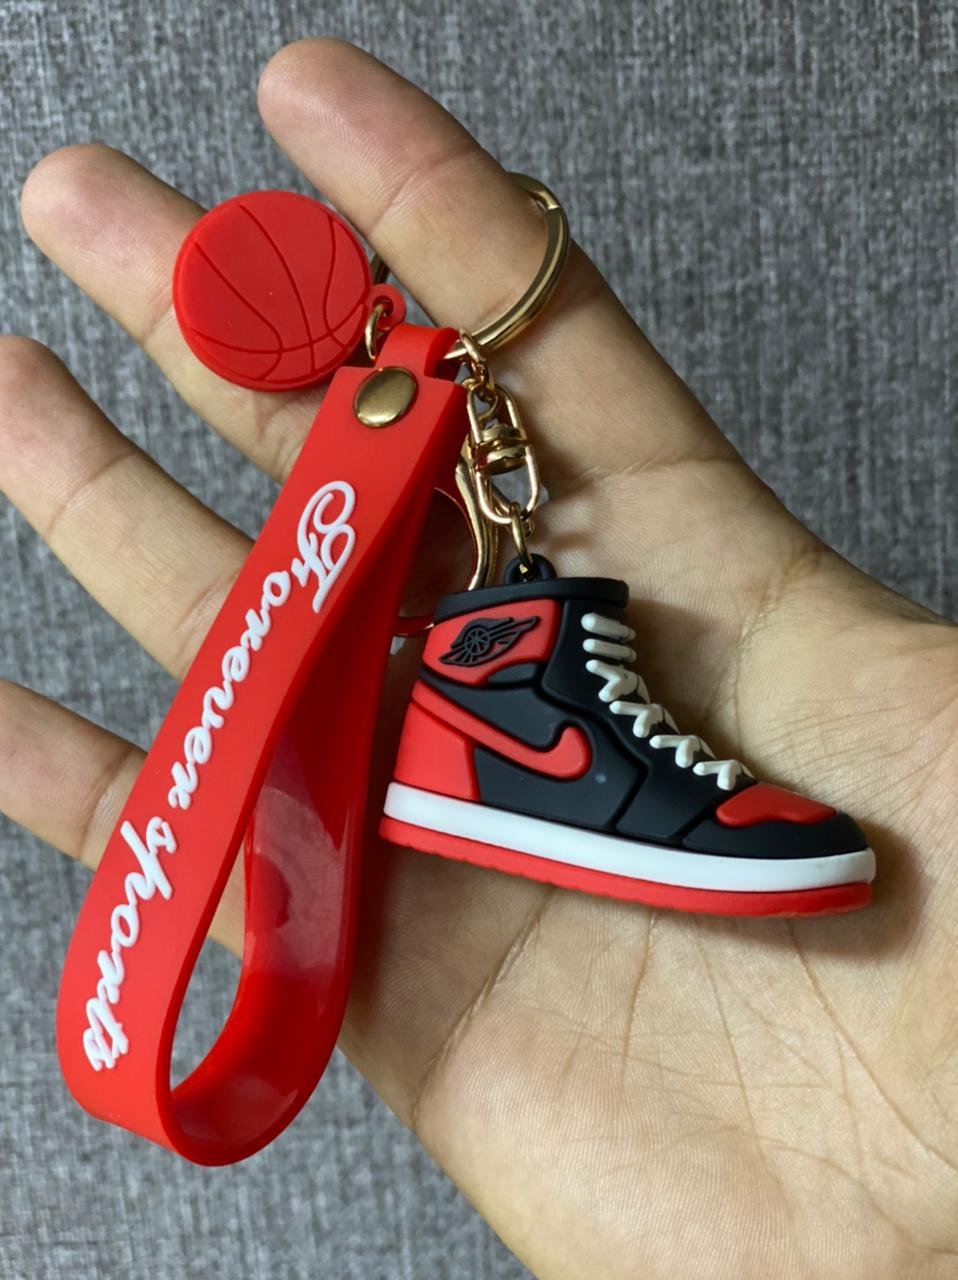 Chaveiro Nike SB x Jordan (Preta e Vermelha) Basquete NBA